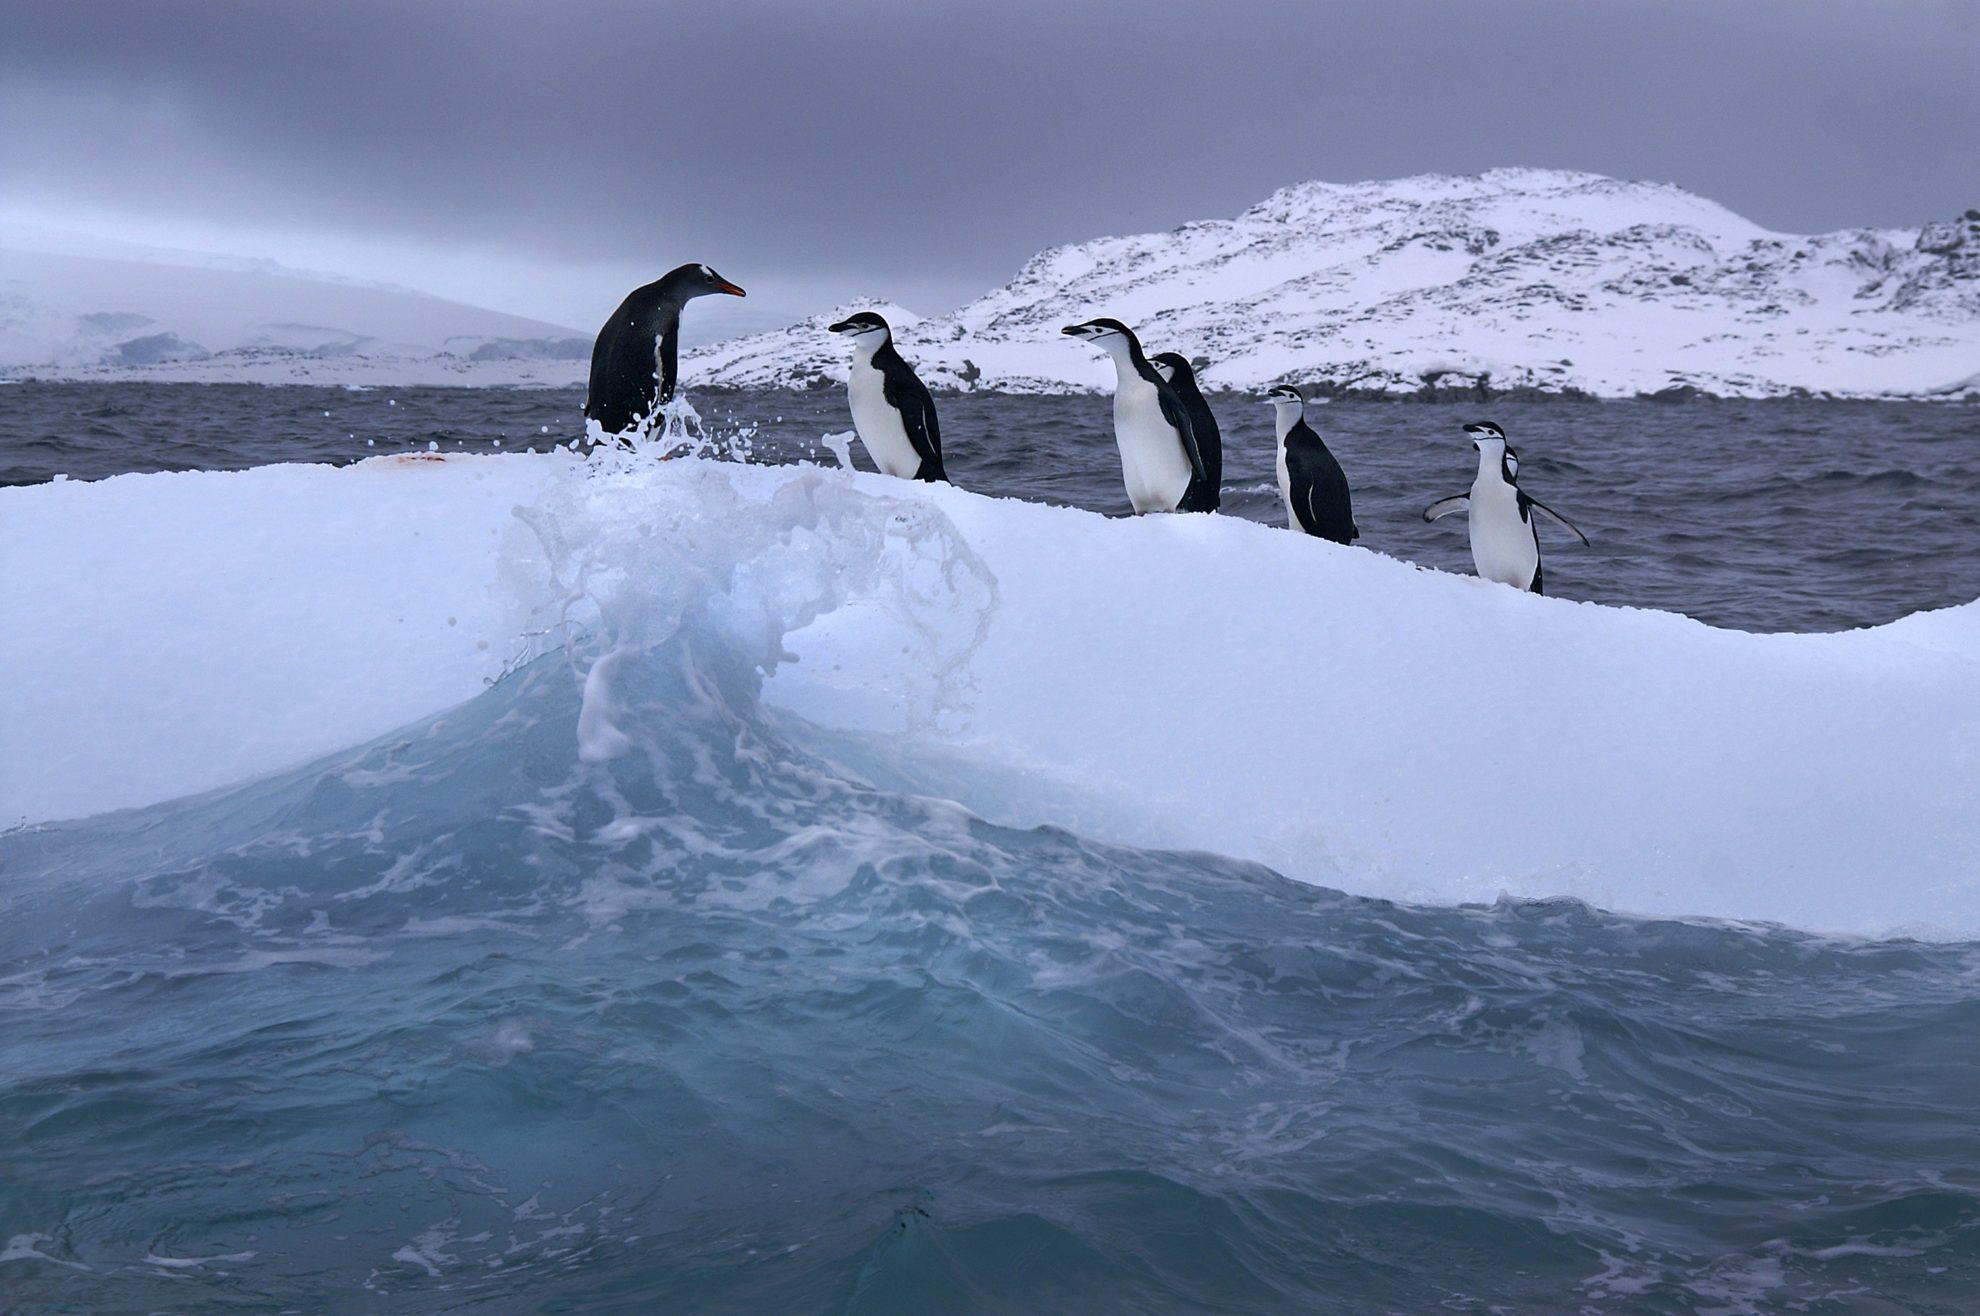 Пингвины на дрейфующей льдине. Photo by Scott Canon/Kansas City Star/MCT via Getty